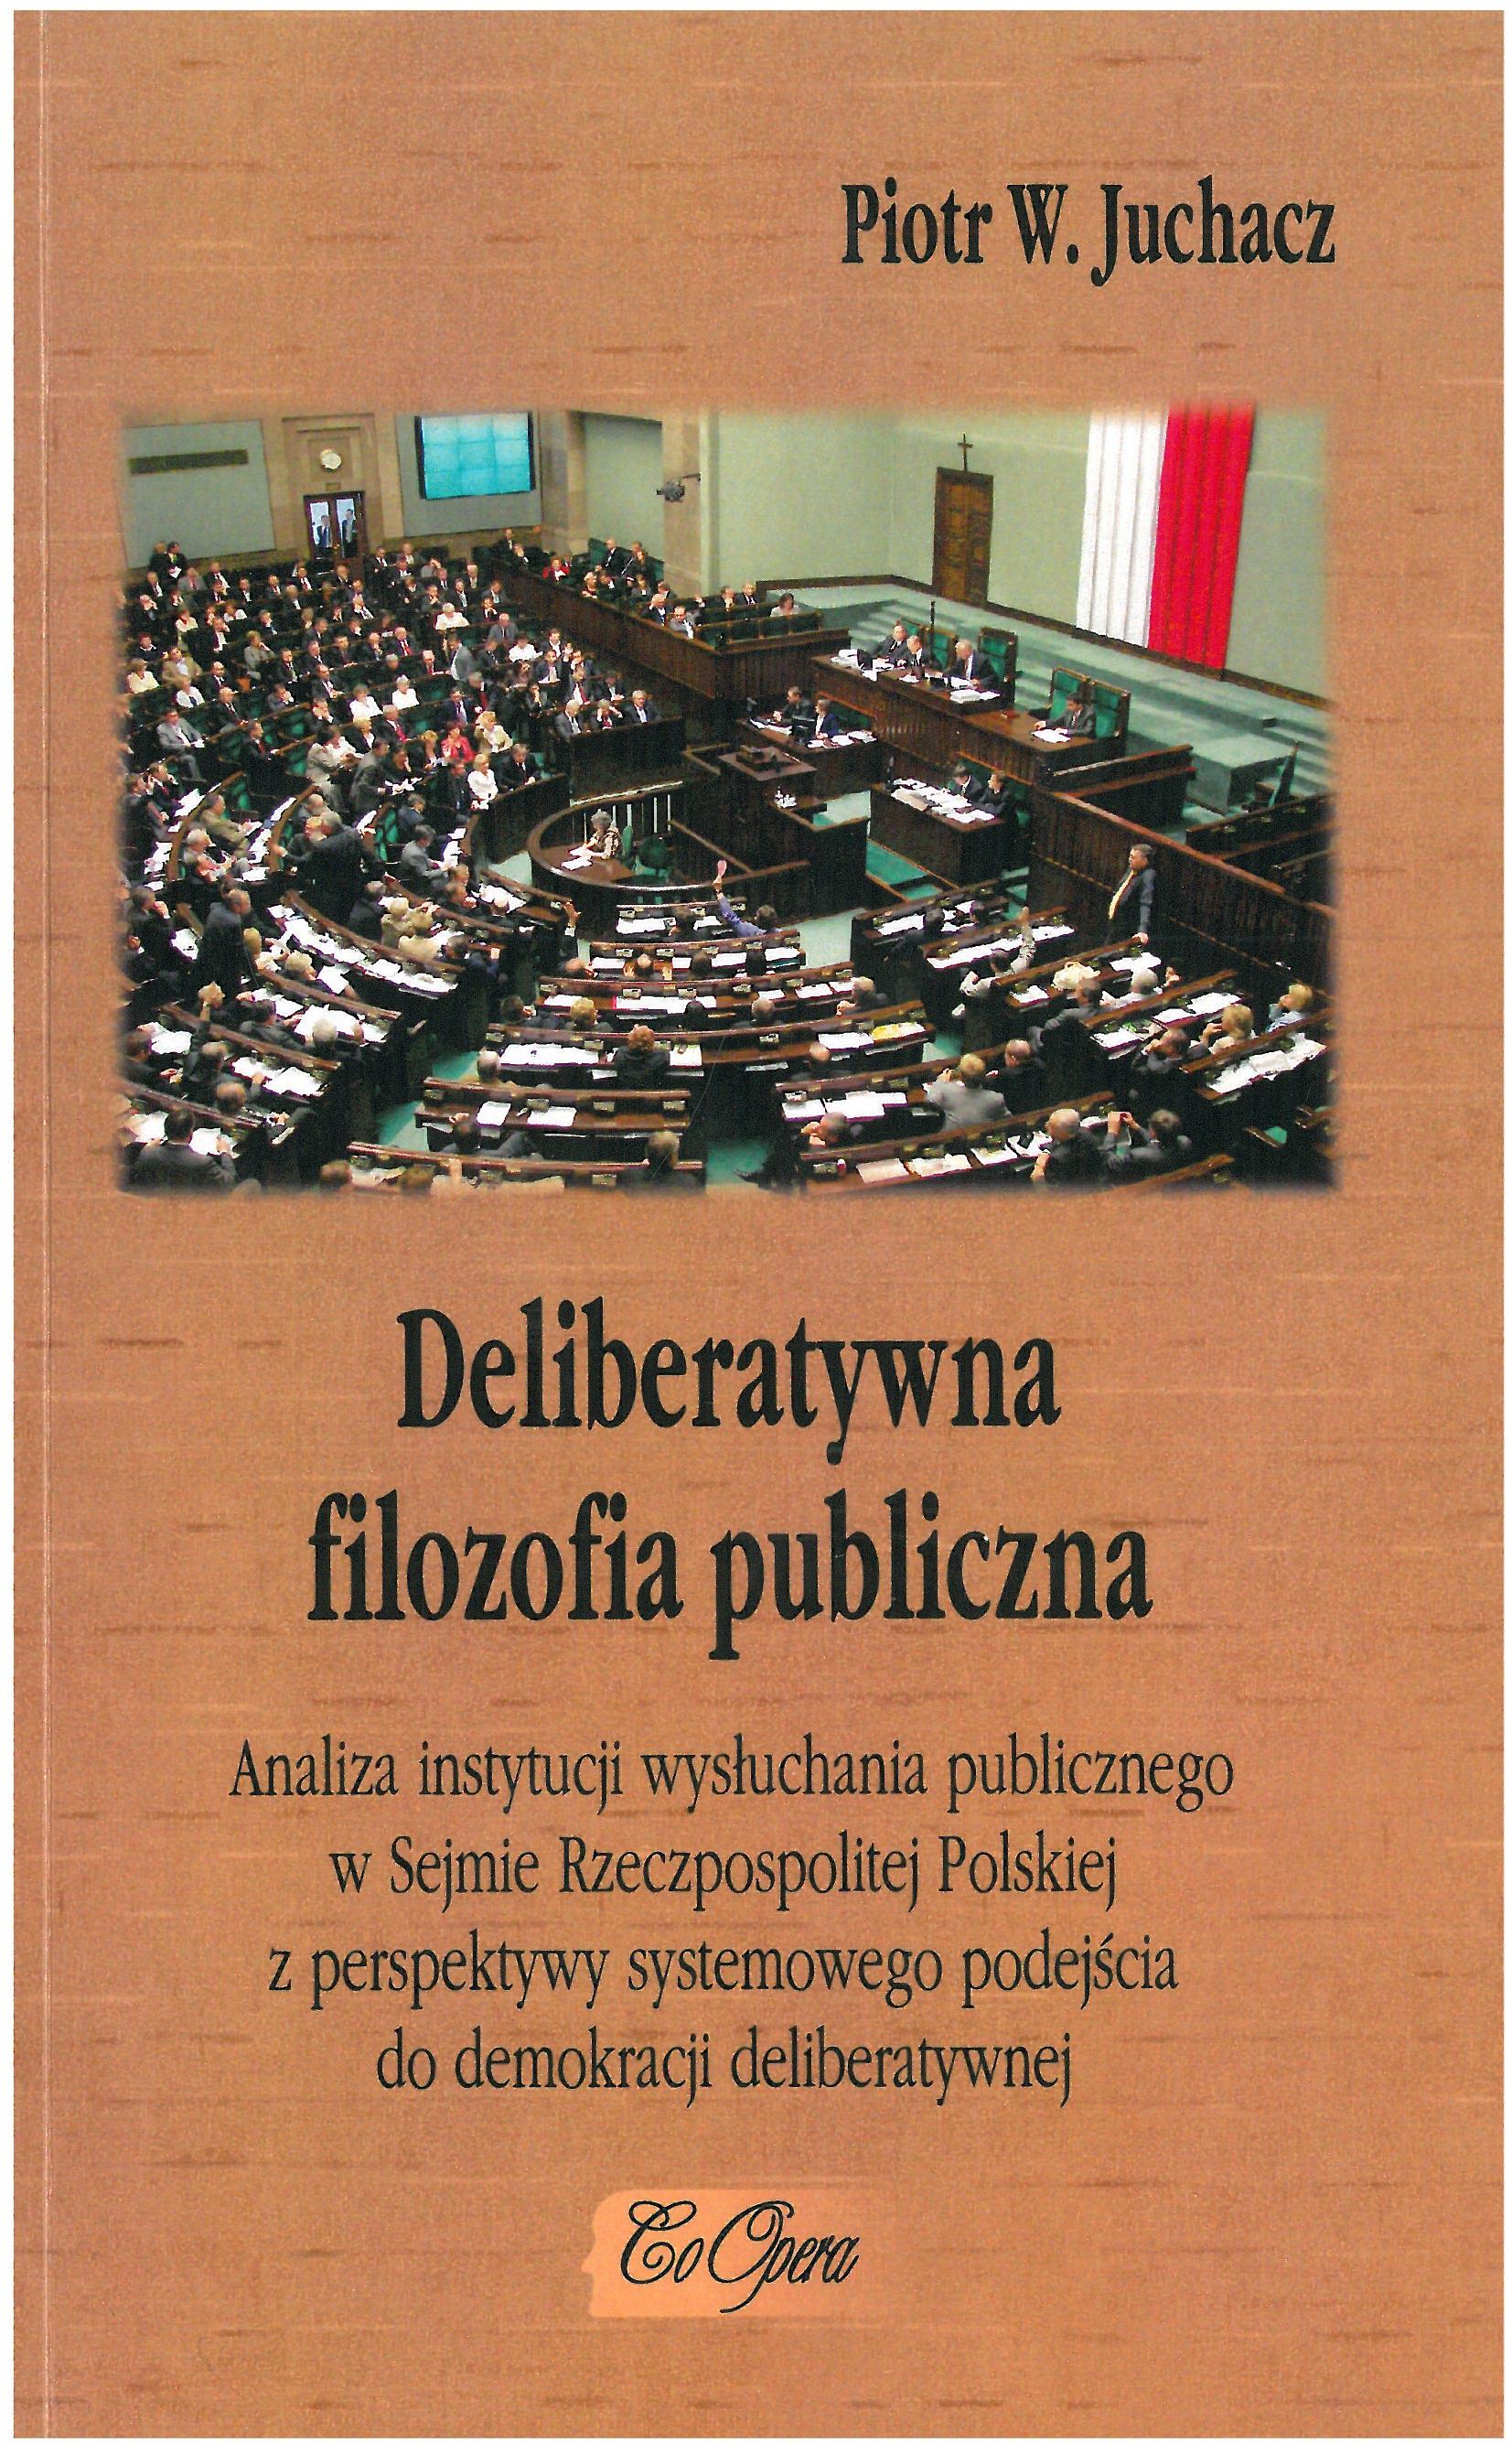 Deliberatywna filozofia publiczna